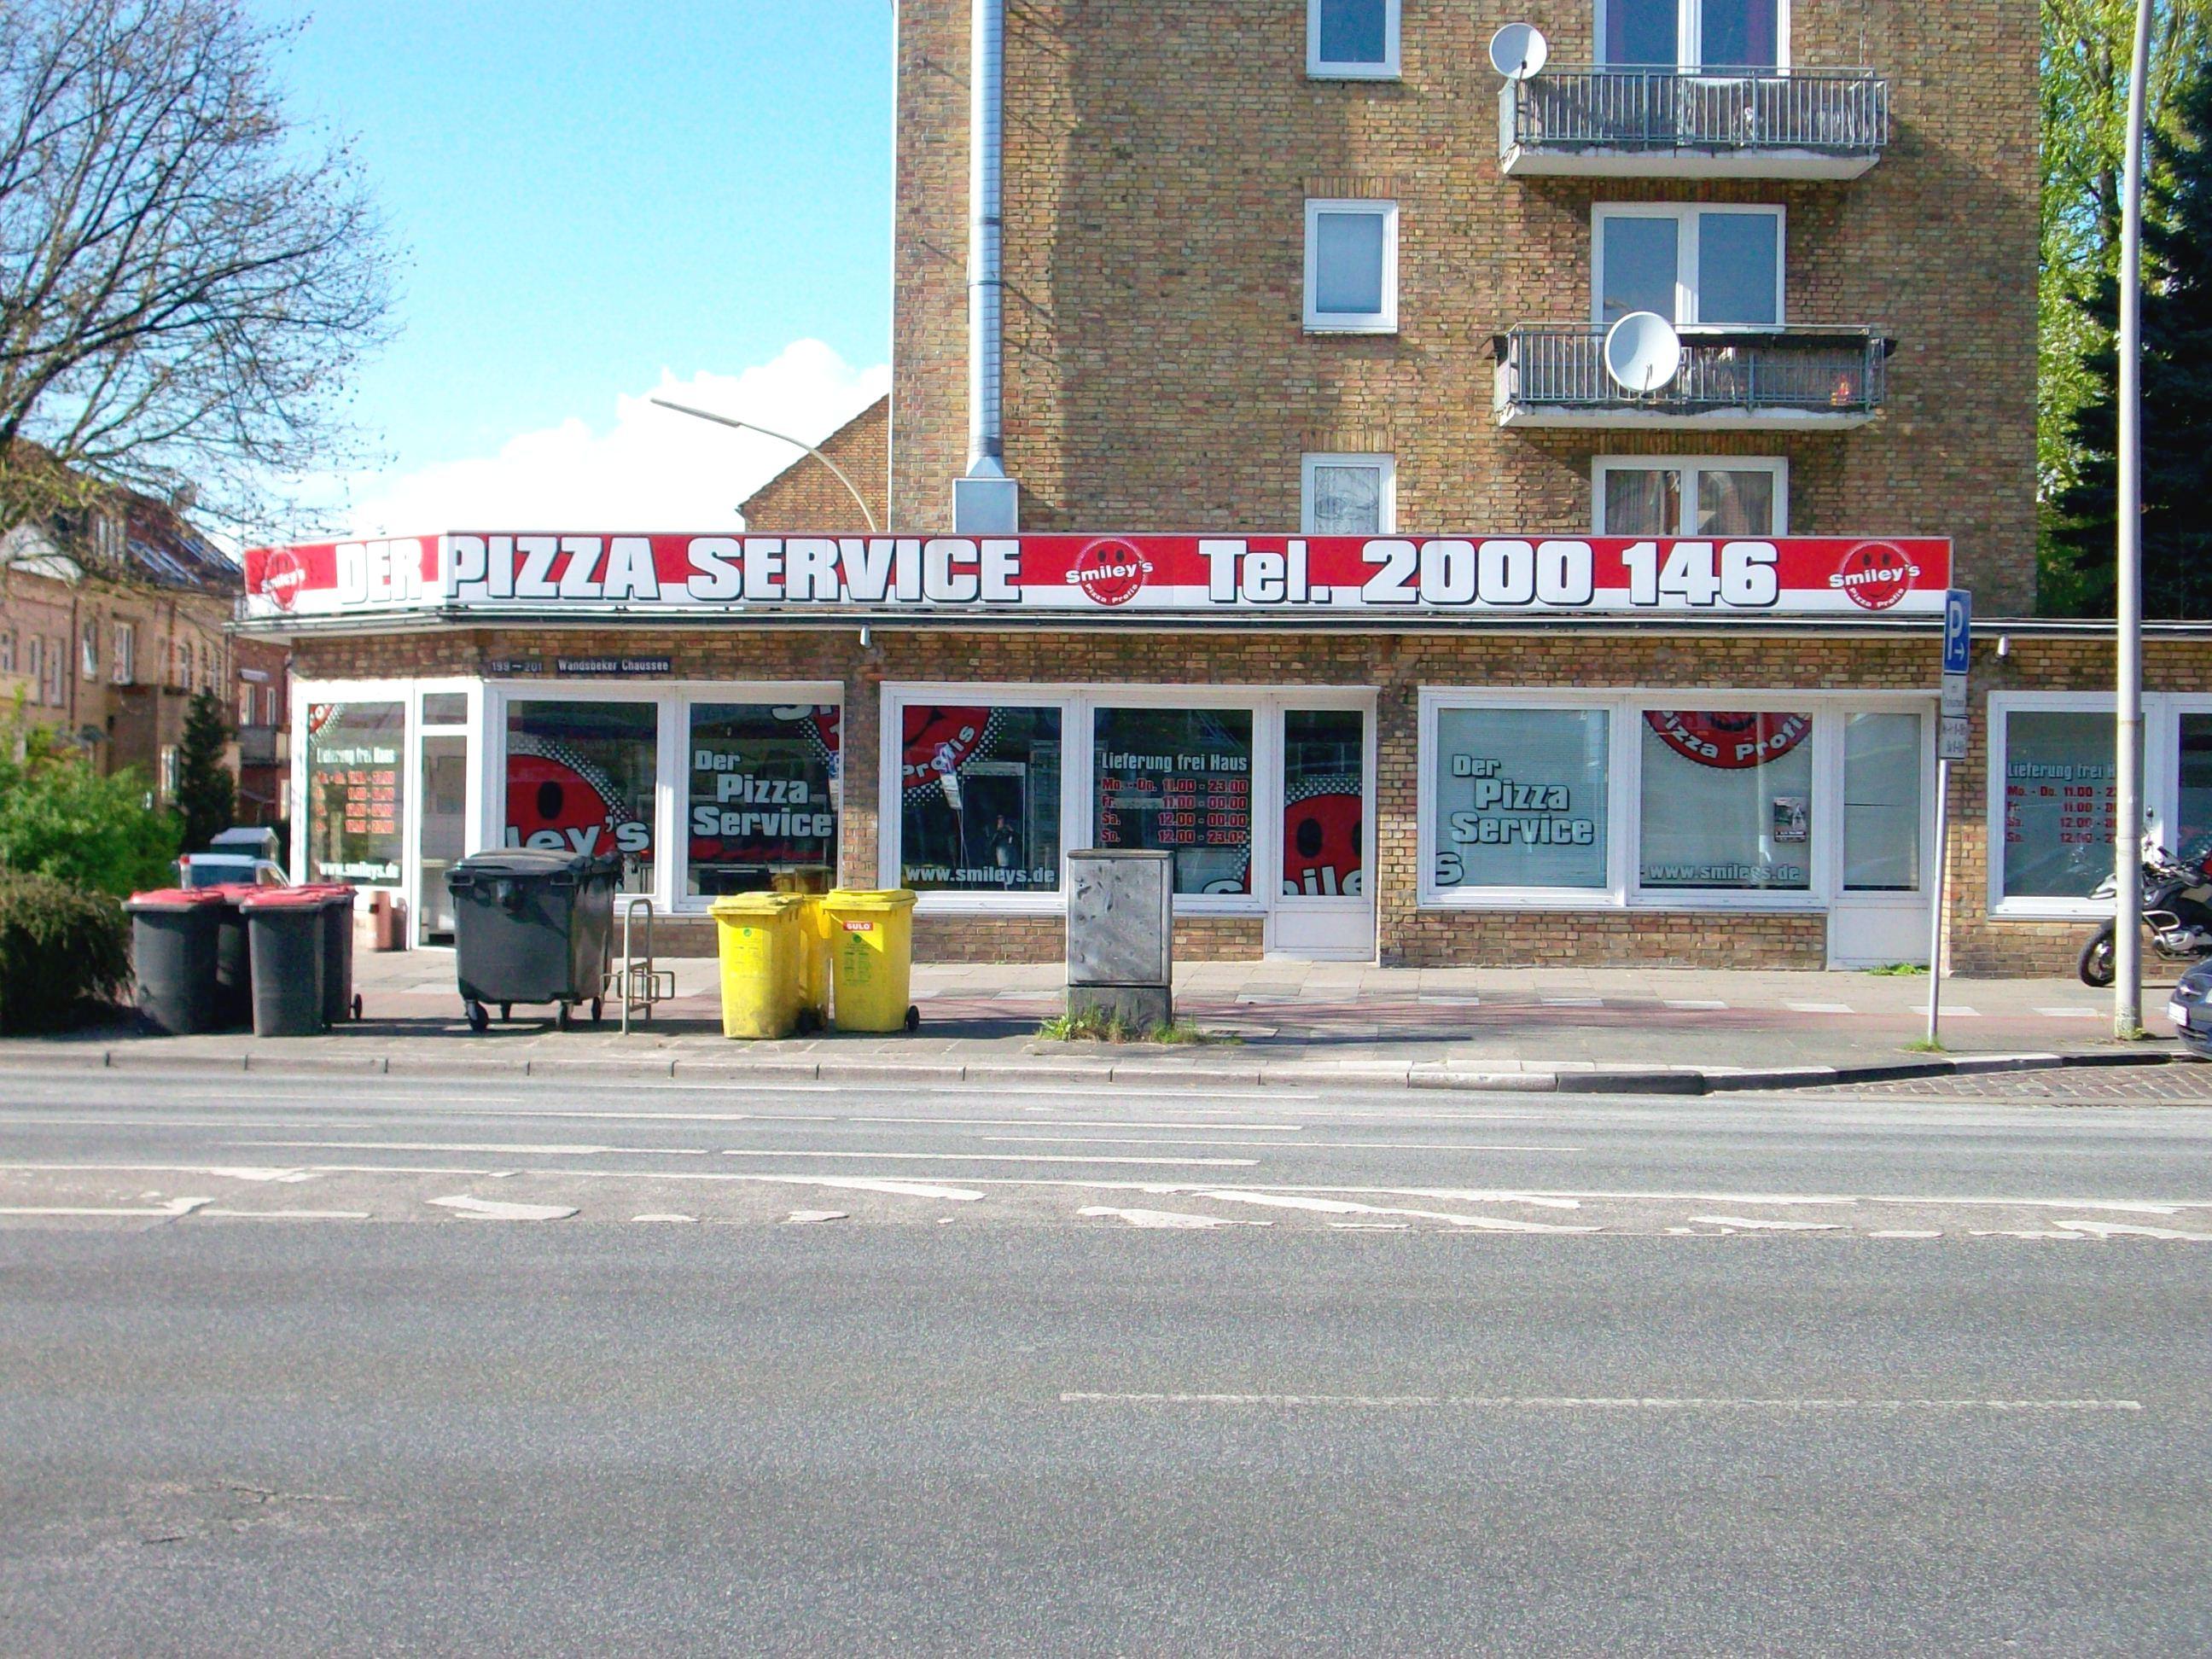 Media Service Hamburg file smileys pizza service hamburg 04 jpg wikimedia commons